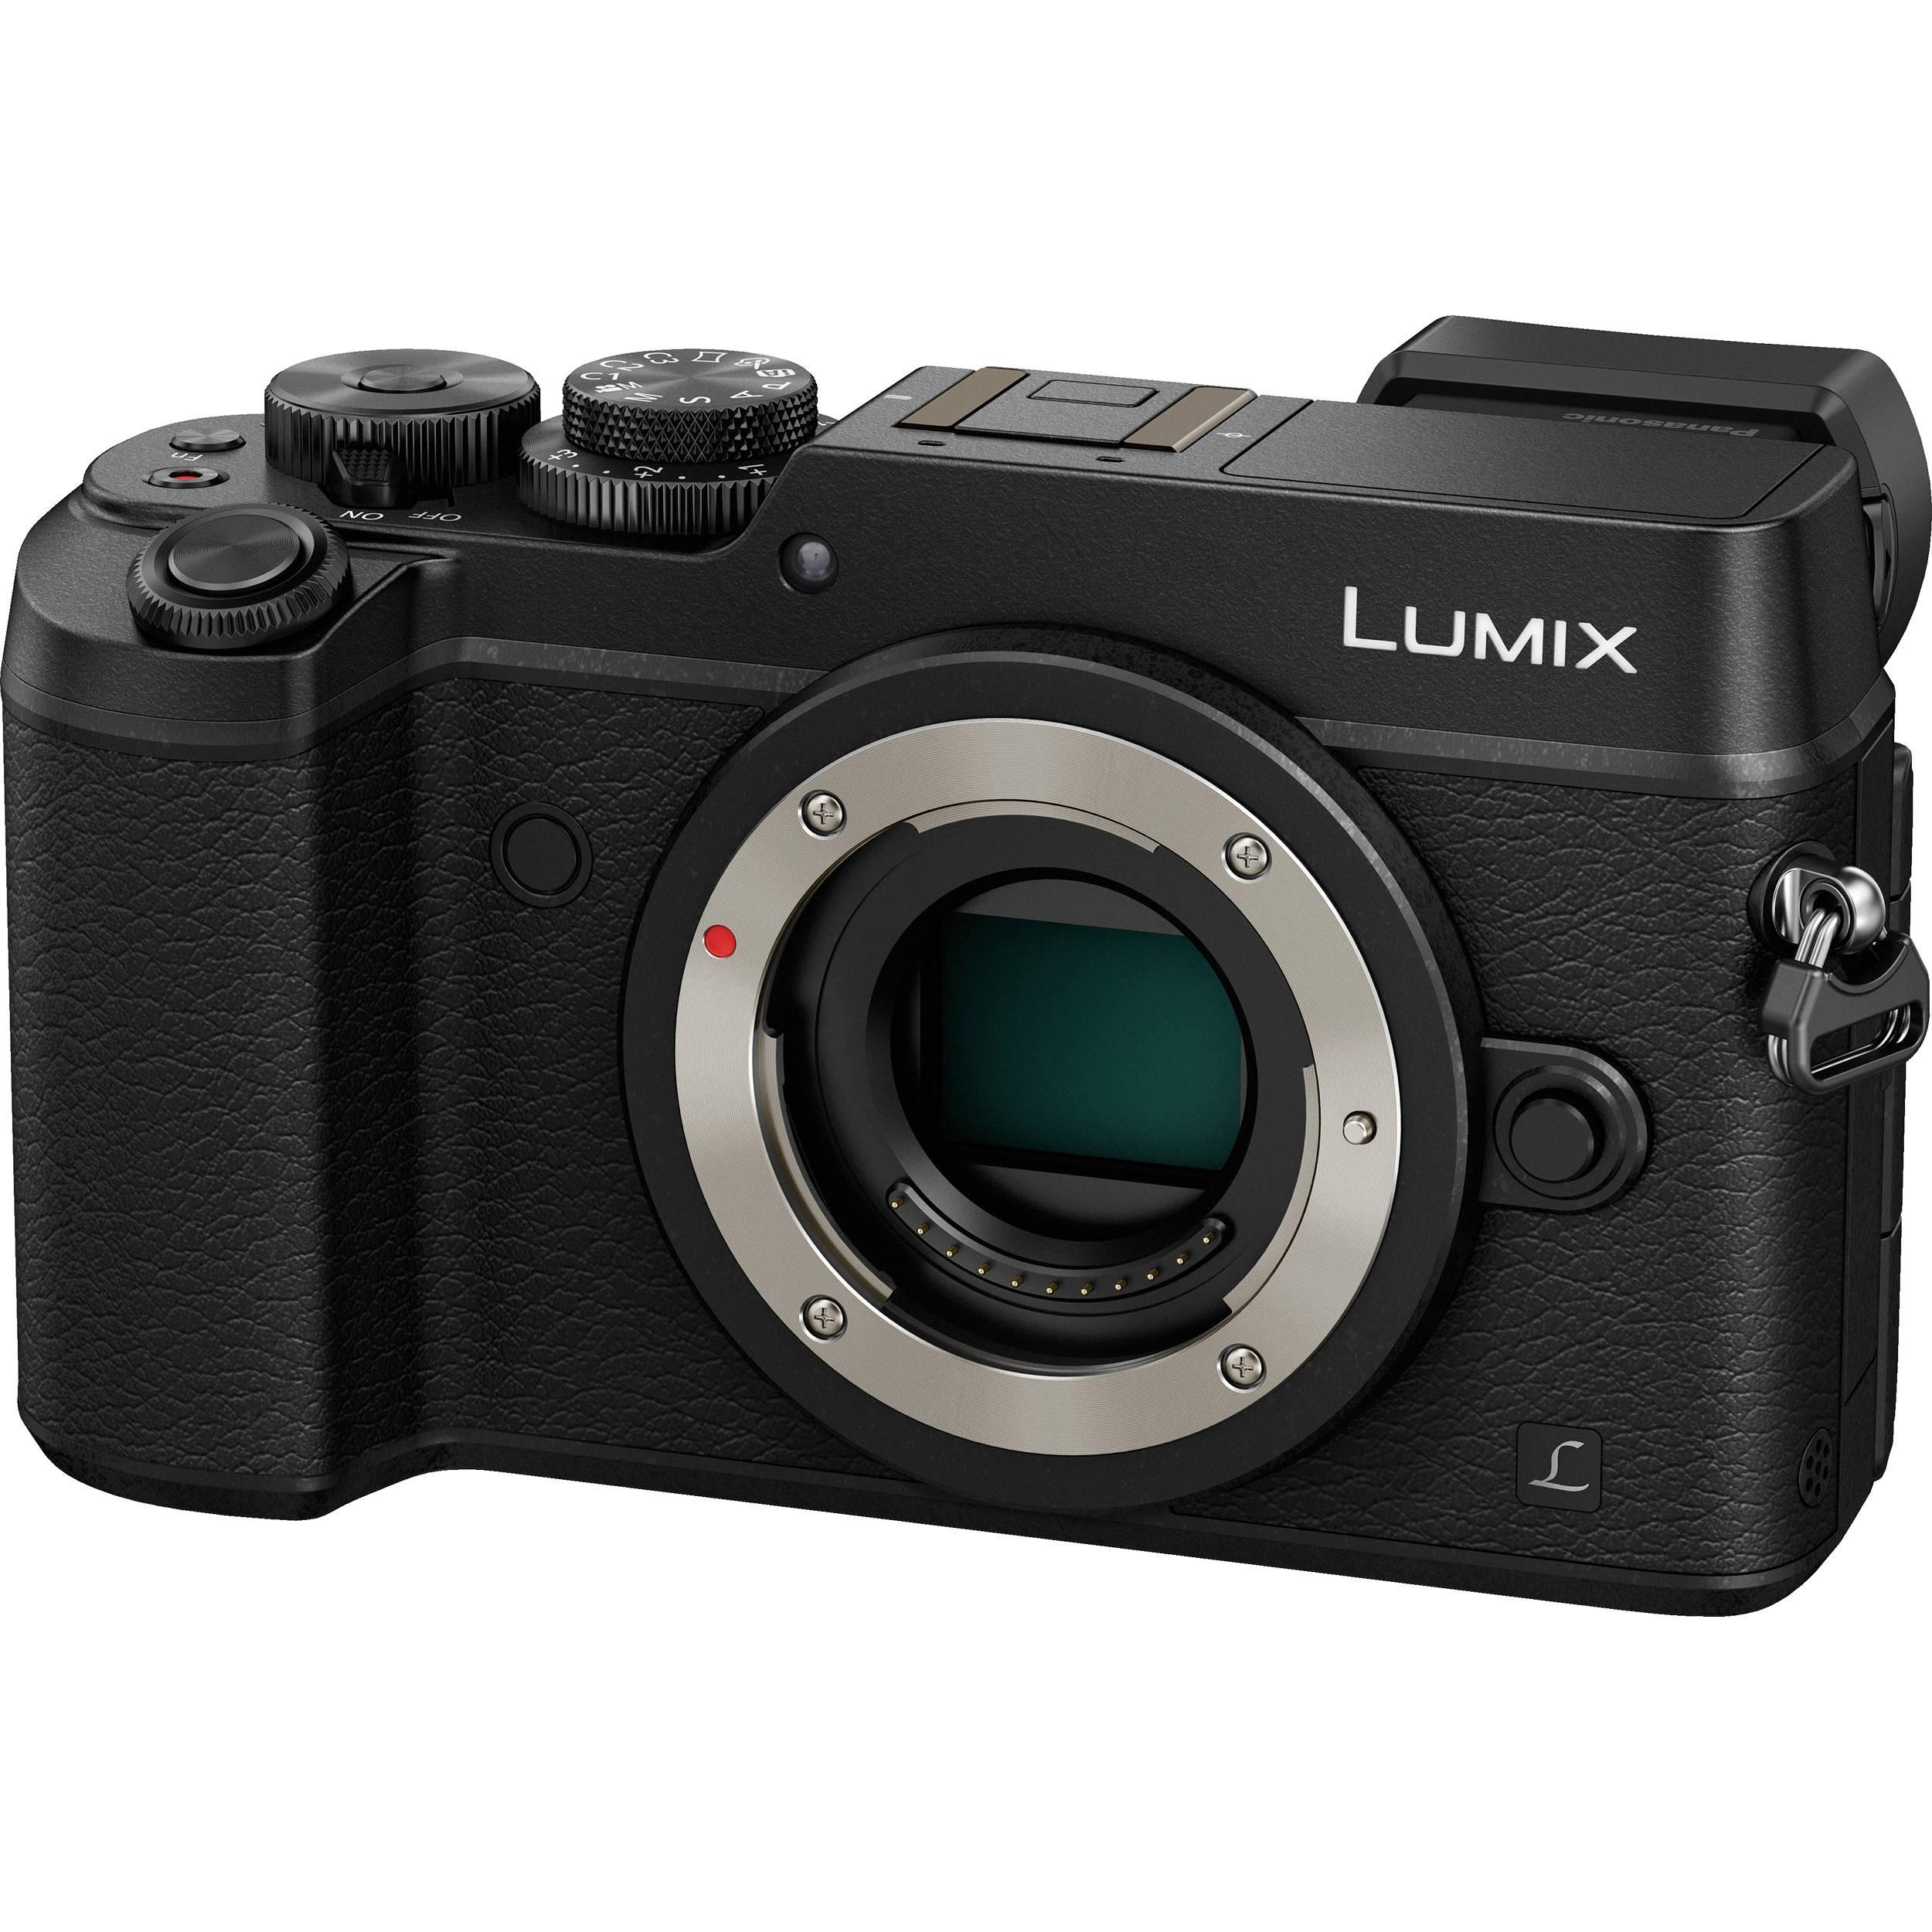 Panasonic Lumix DMC-GX8 Body Black